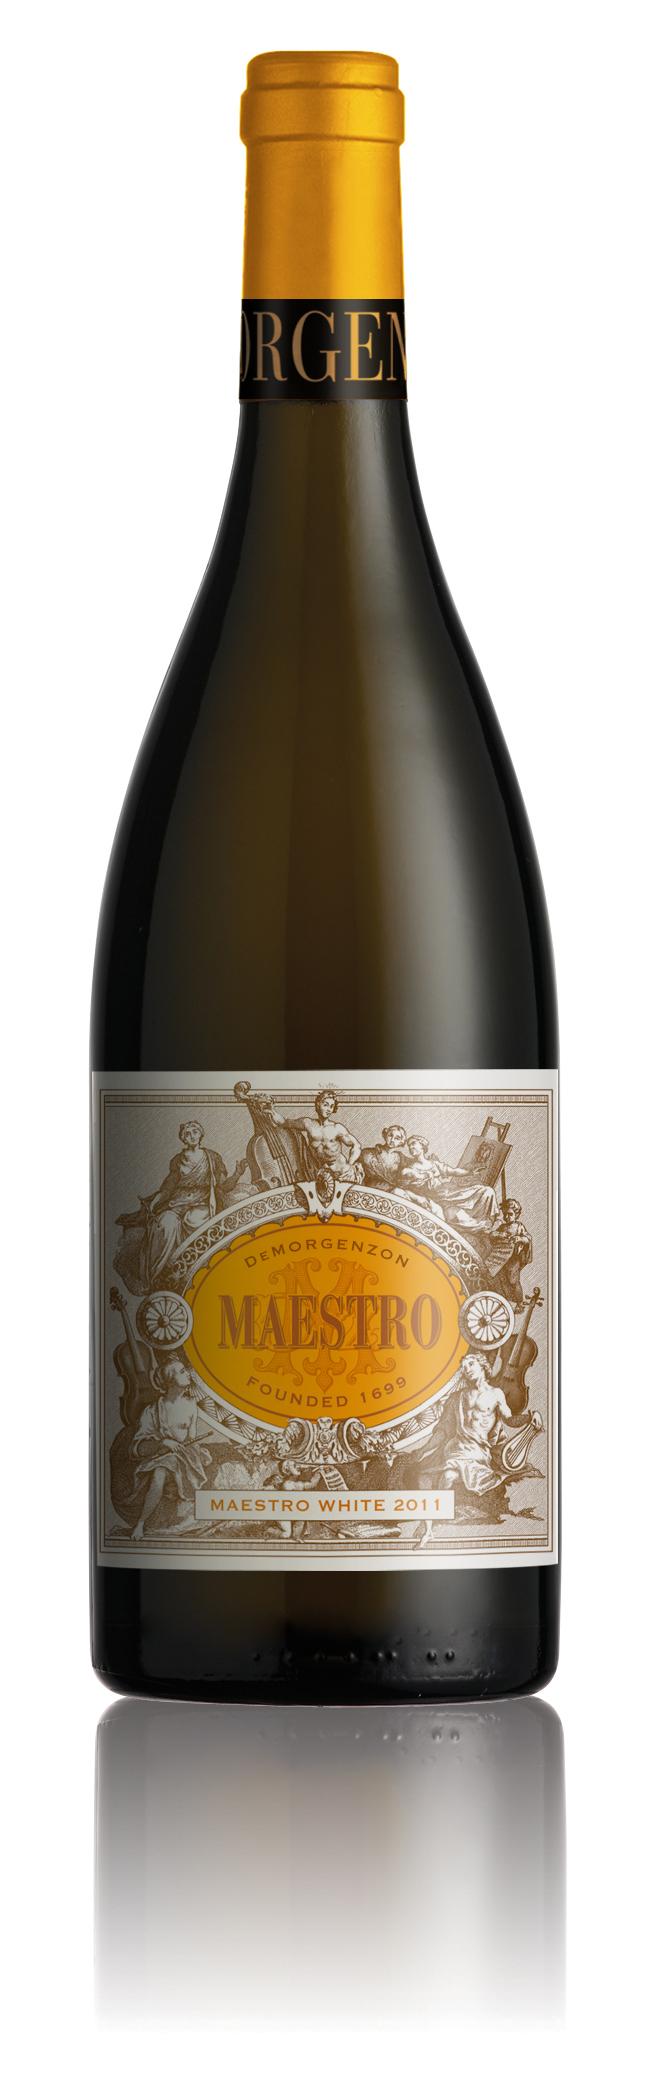 Maestro White (Roussanne, Chardonnay, Chenin, Viognier, Grenache Blanc)